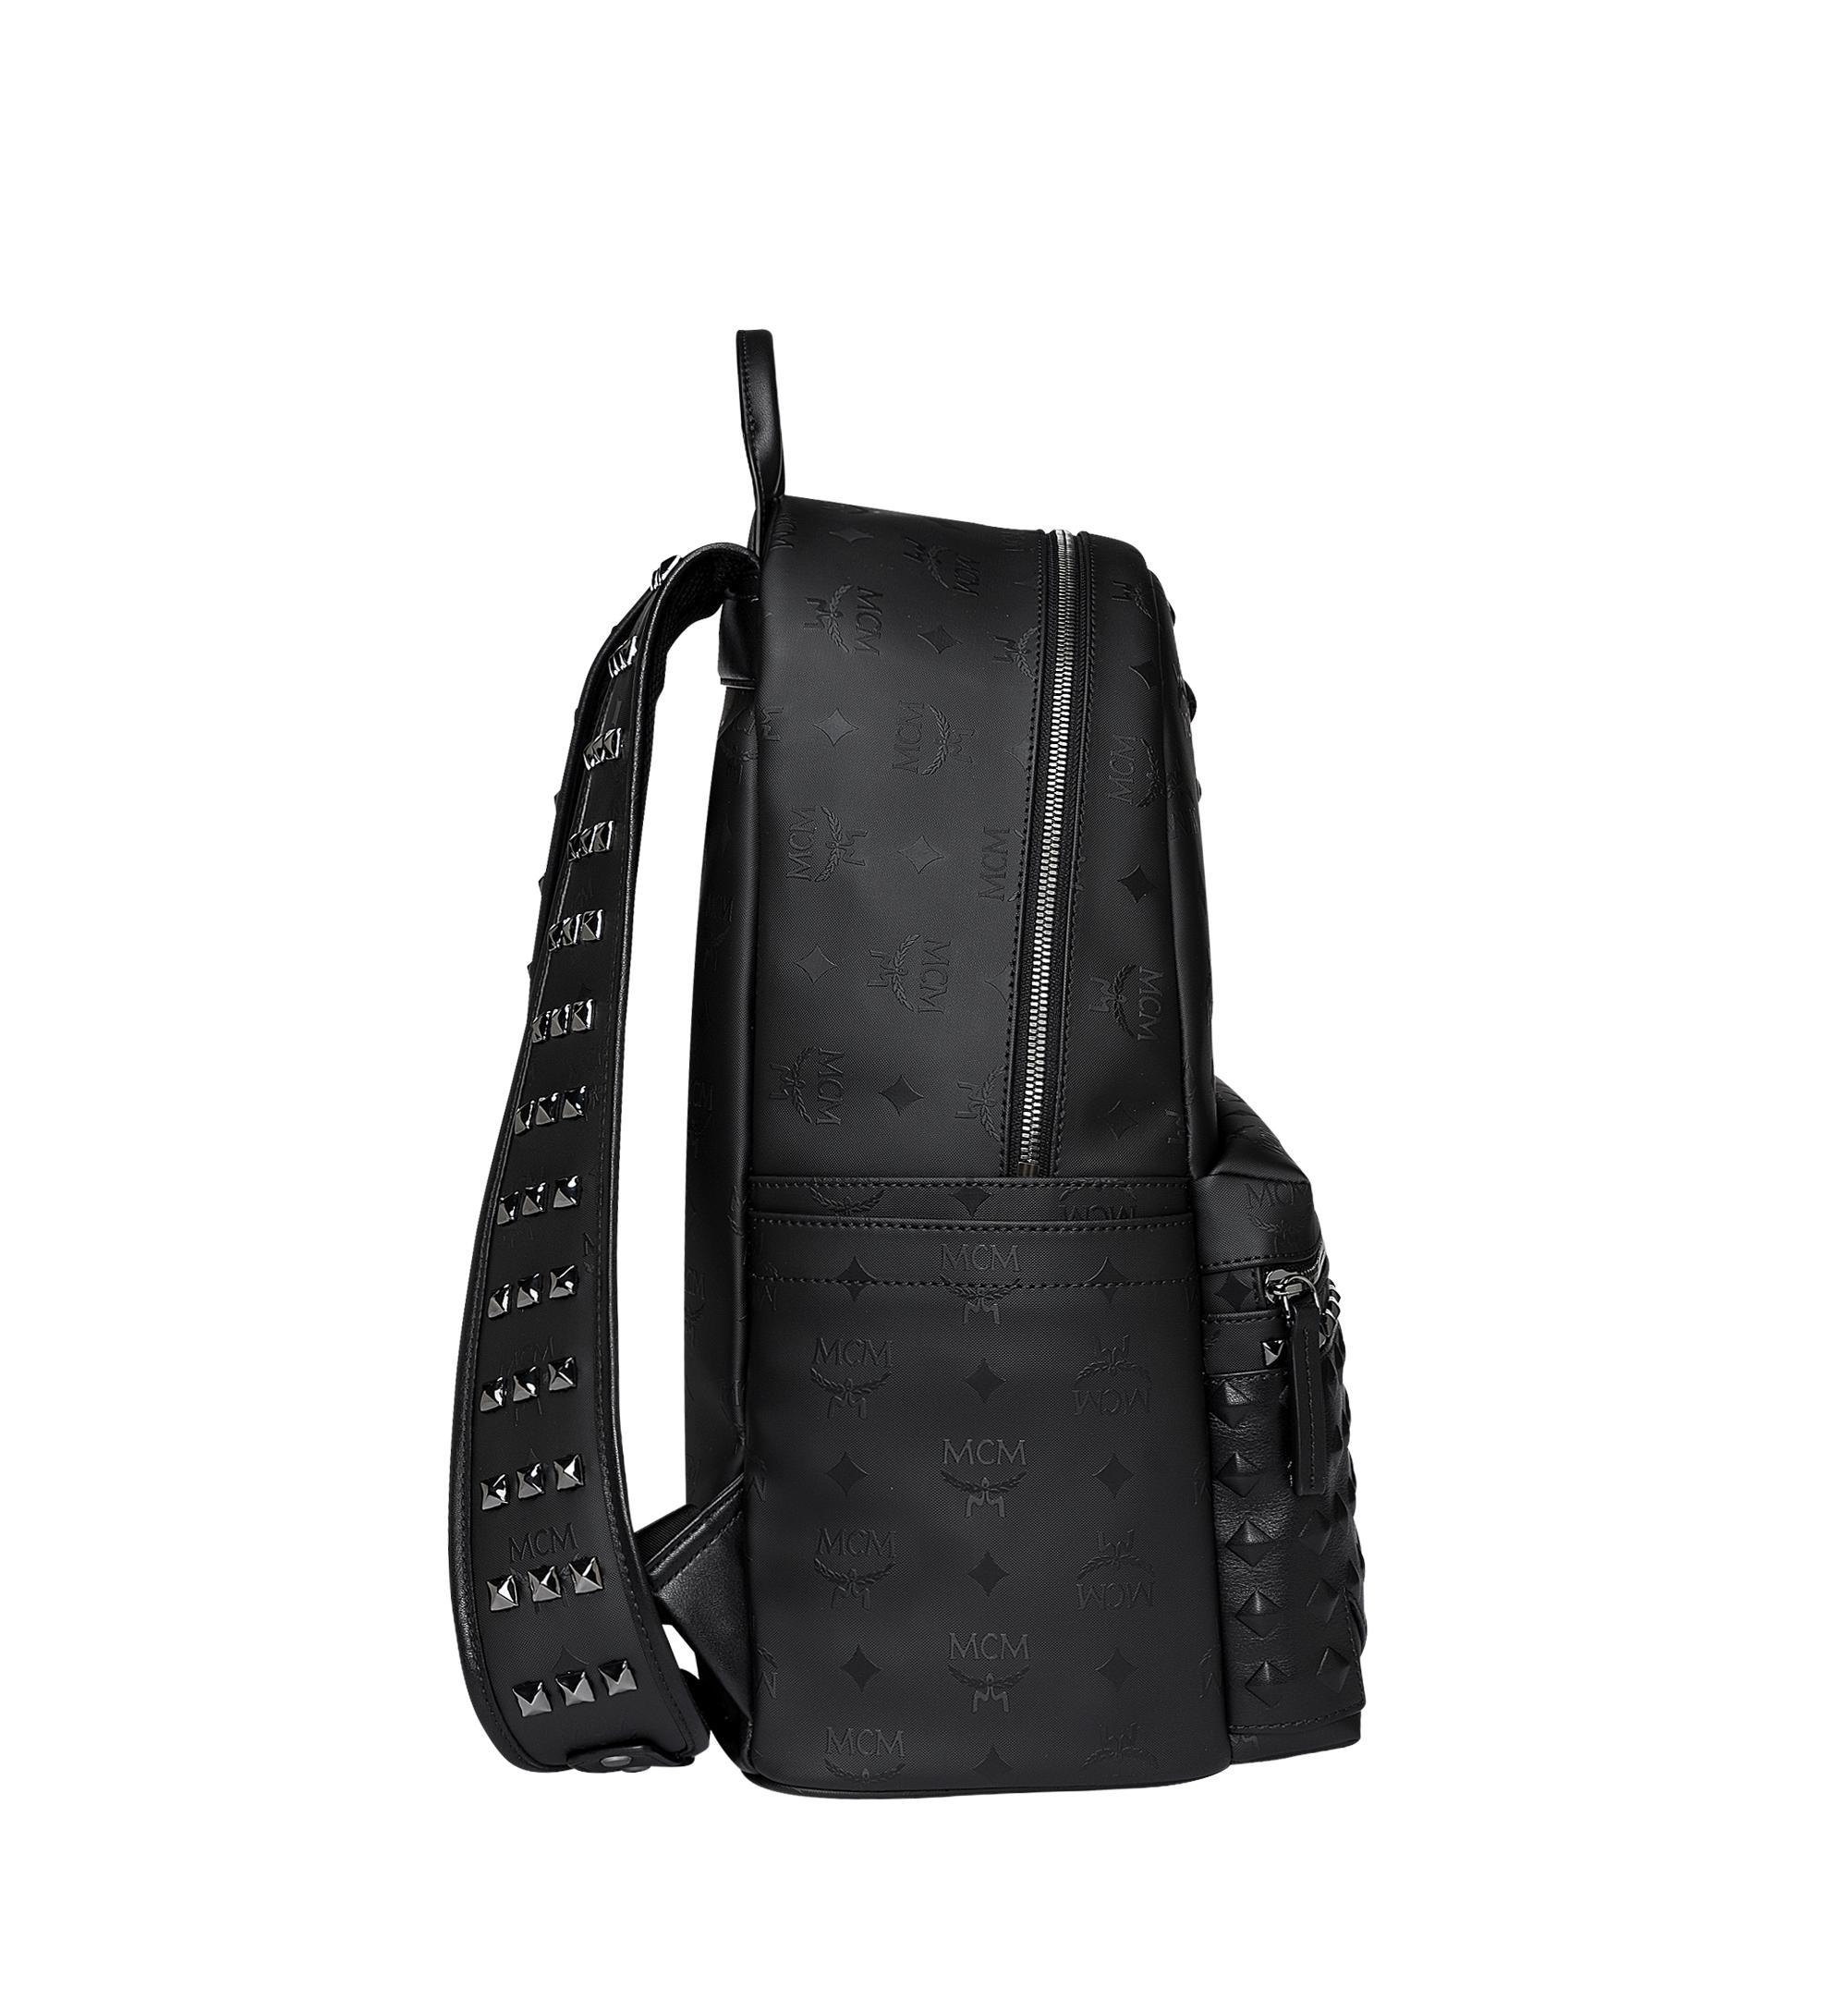 MCM Leather Stark Studs Backpack In Odeon in Black for Men